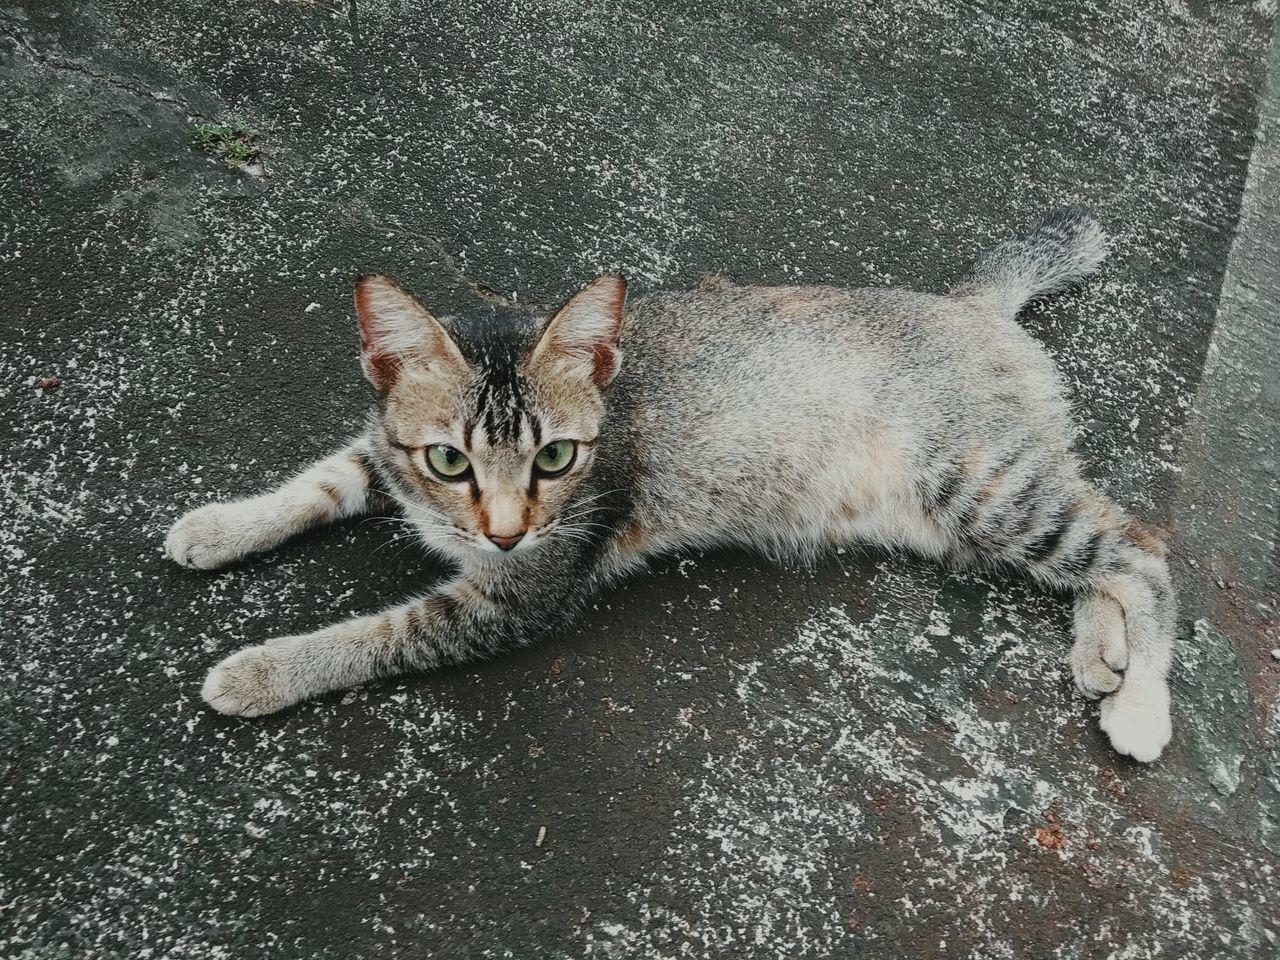 HIGH ANGLE PORTRAIT OF CAT LYING ON FLOOR